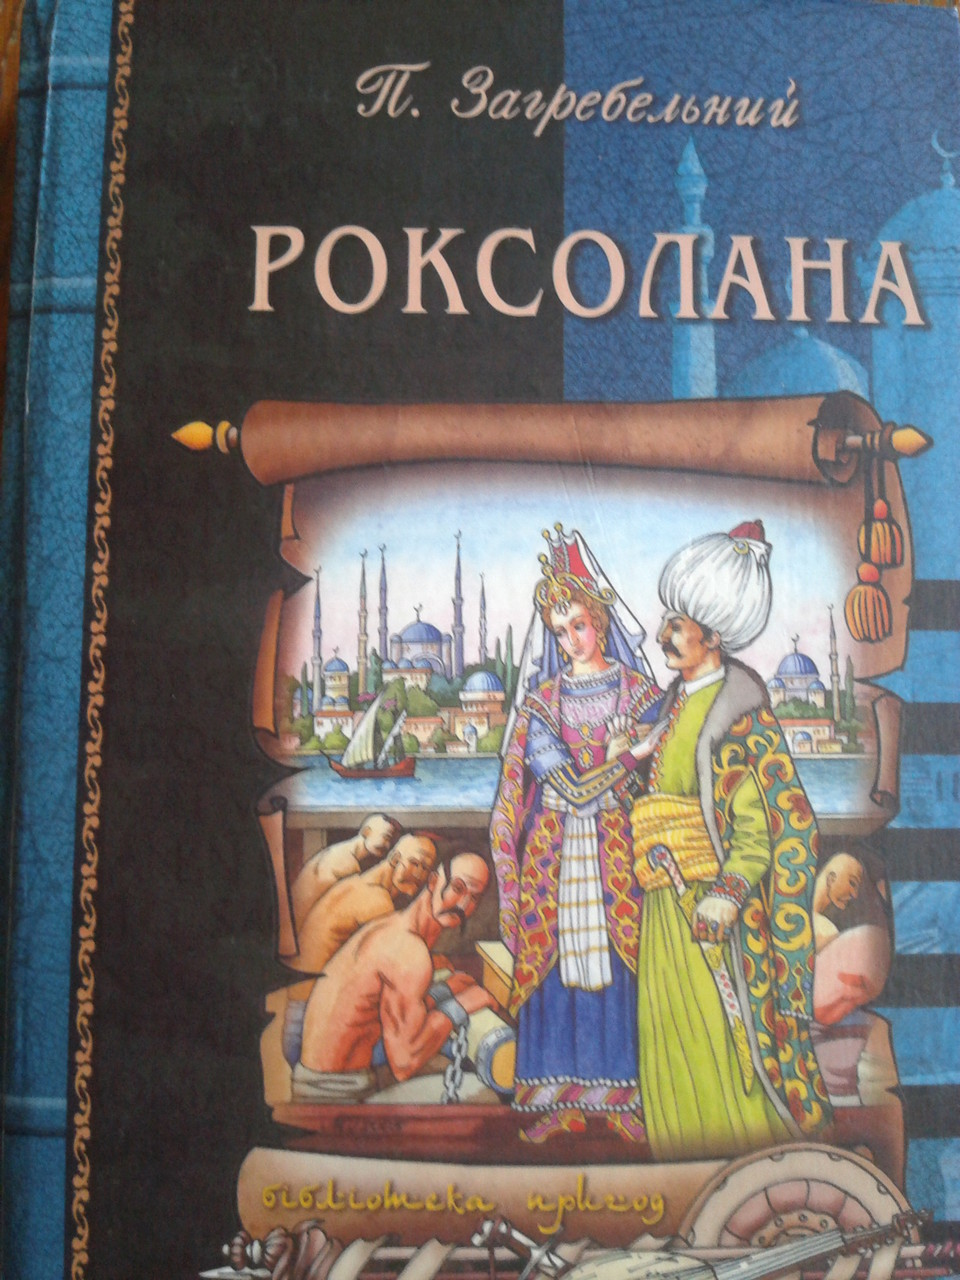 Роксолана — історичний роман українського письменника Павла Загребельного